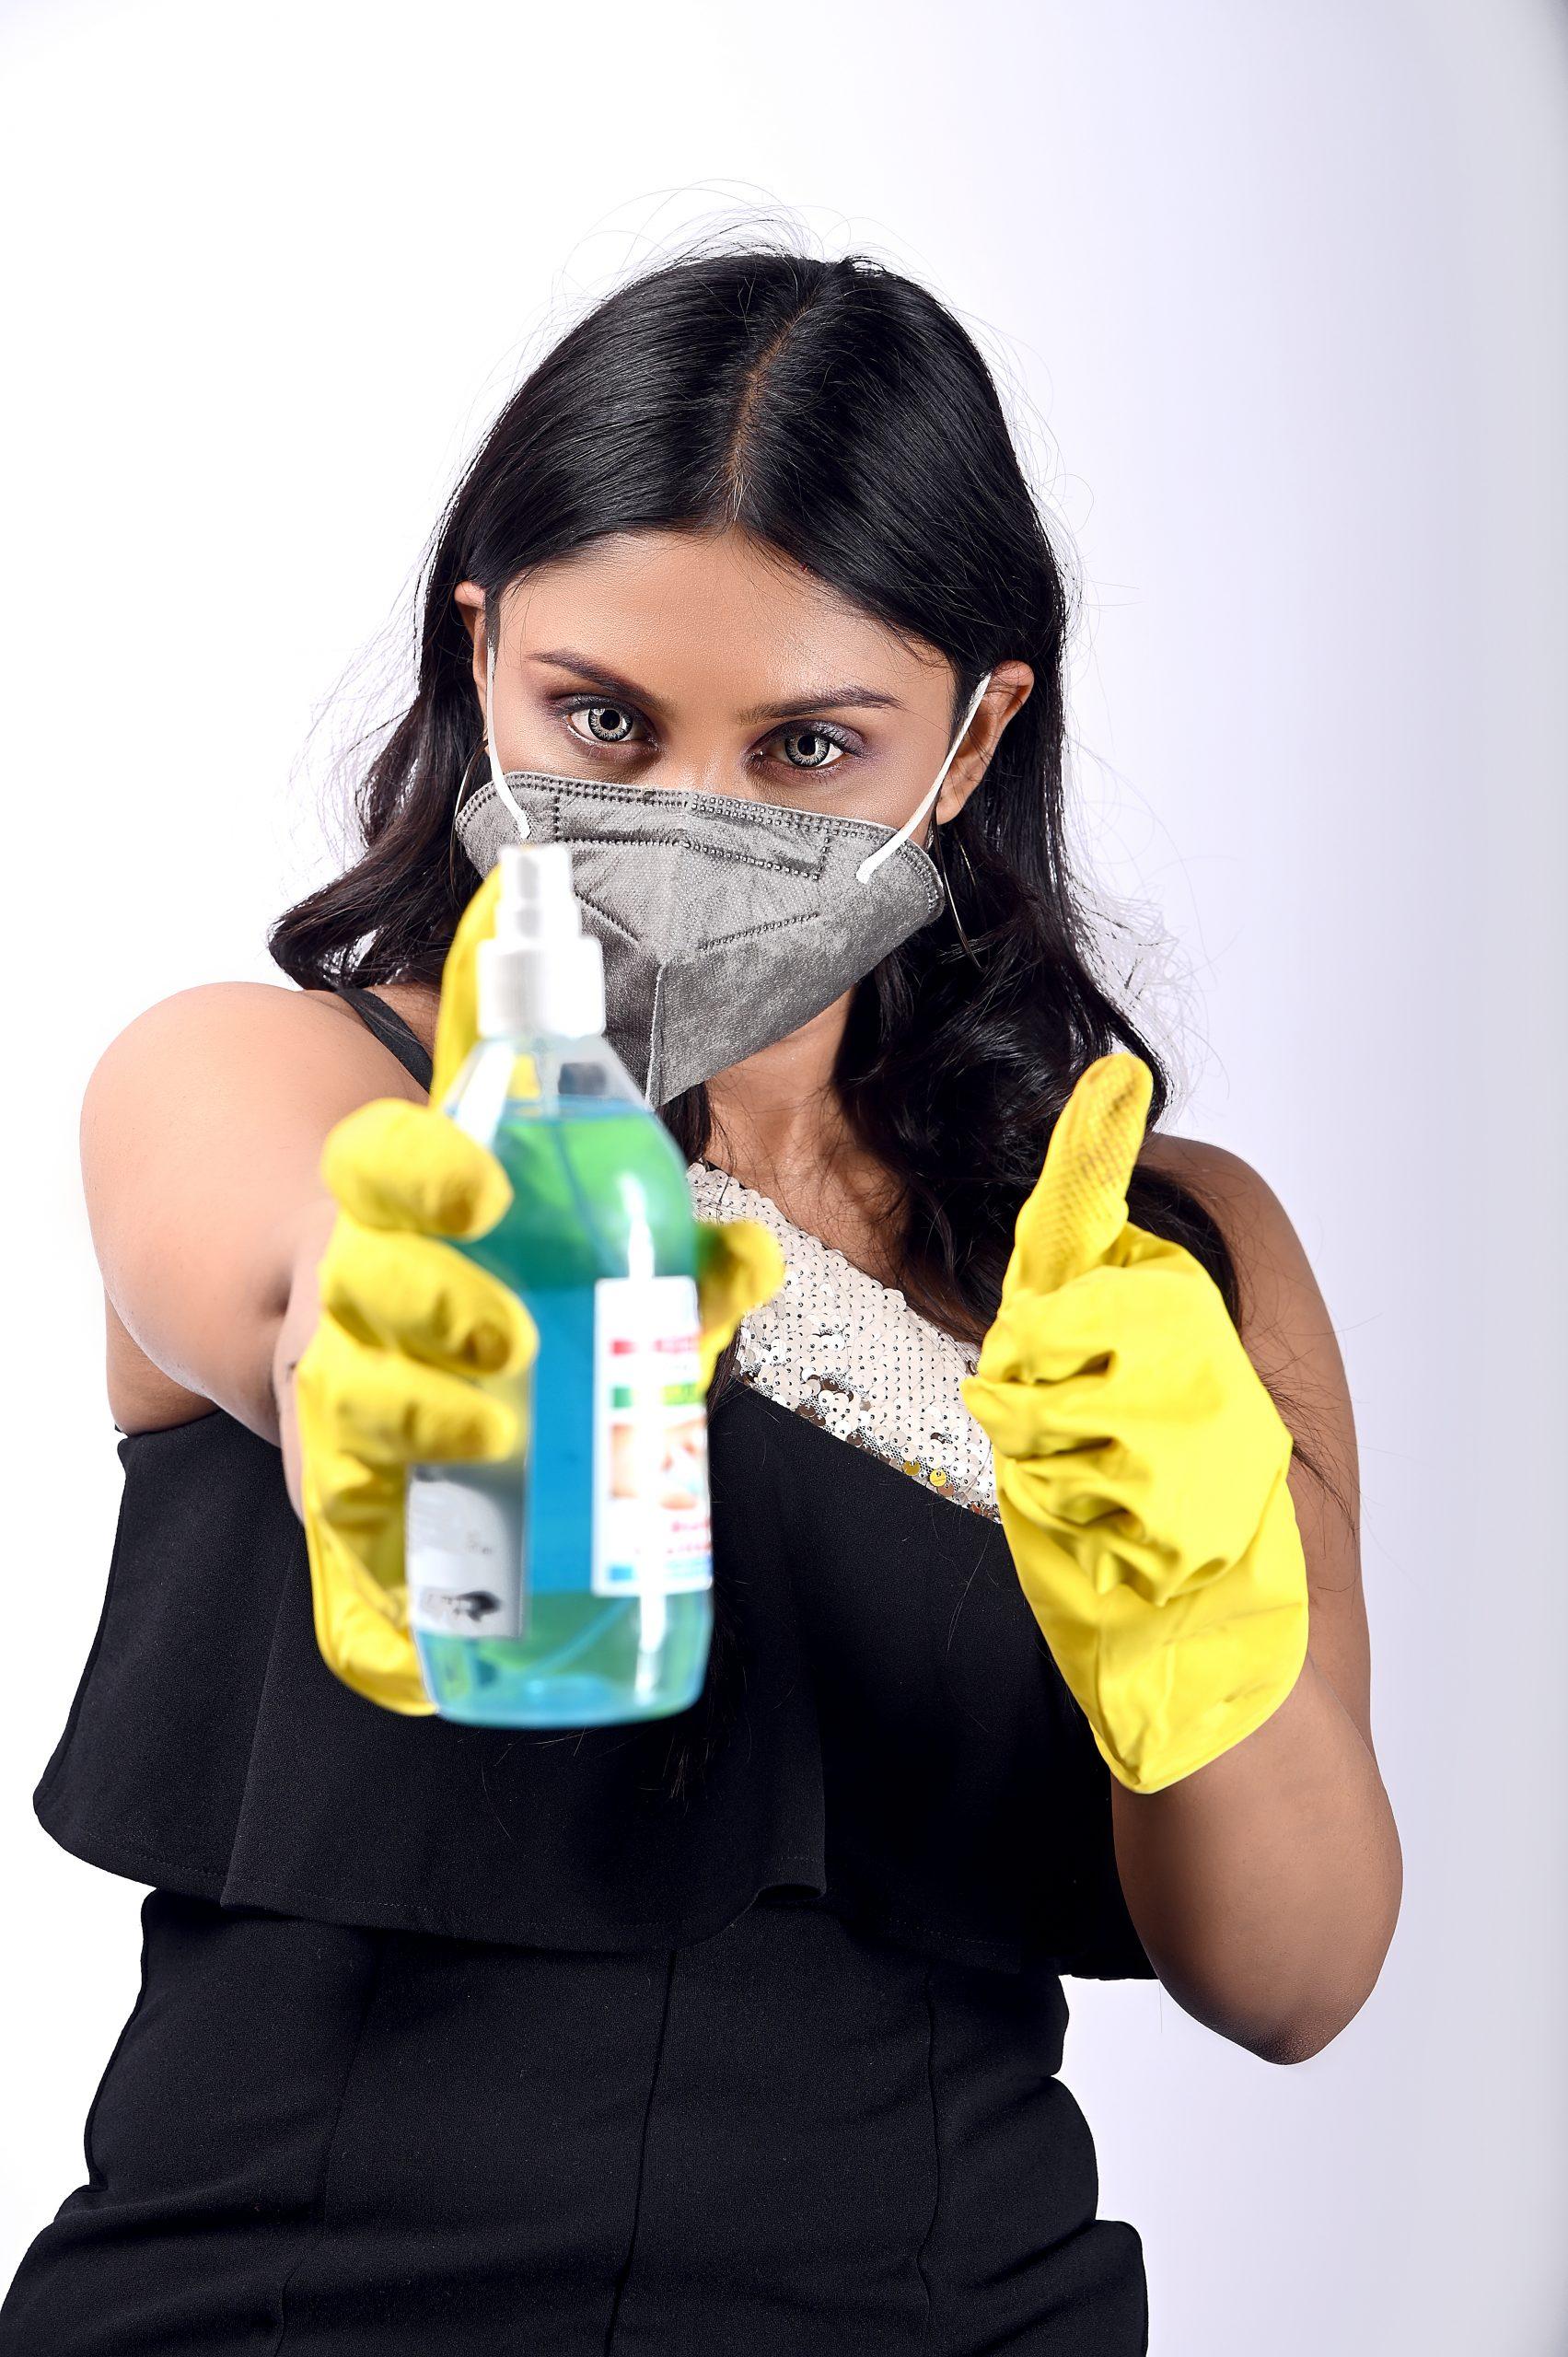 Use mask and sanitizer